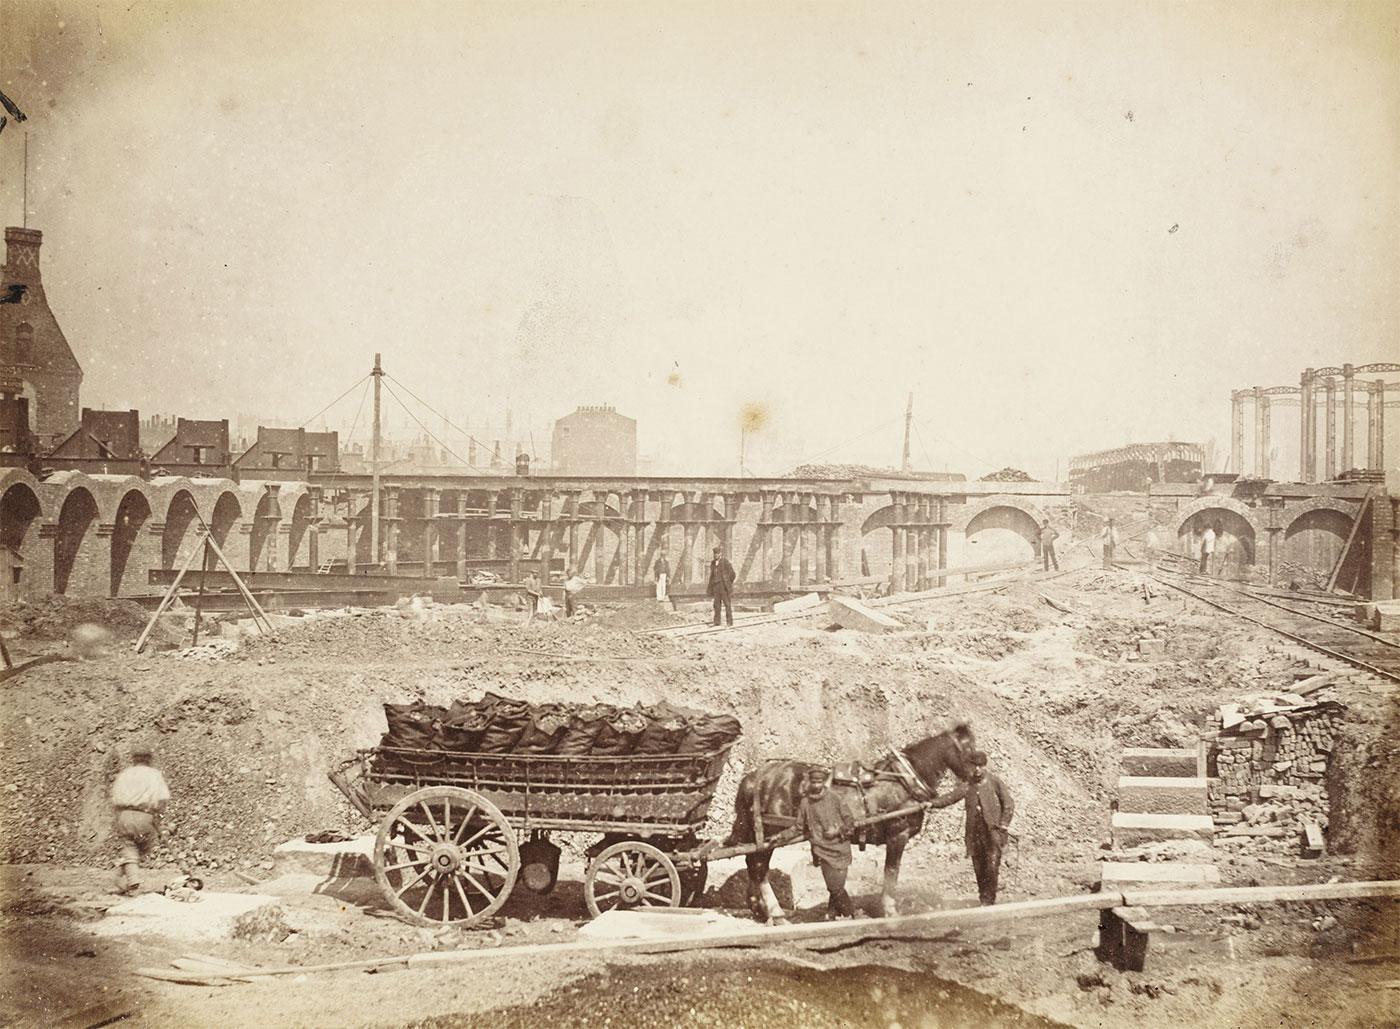 St Pancras station under construction